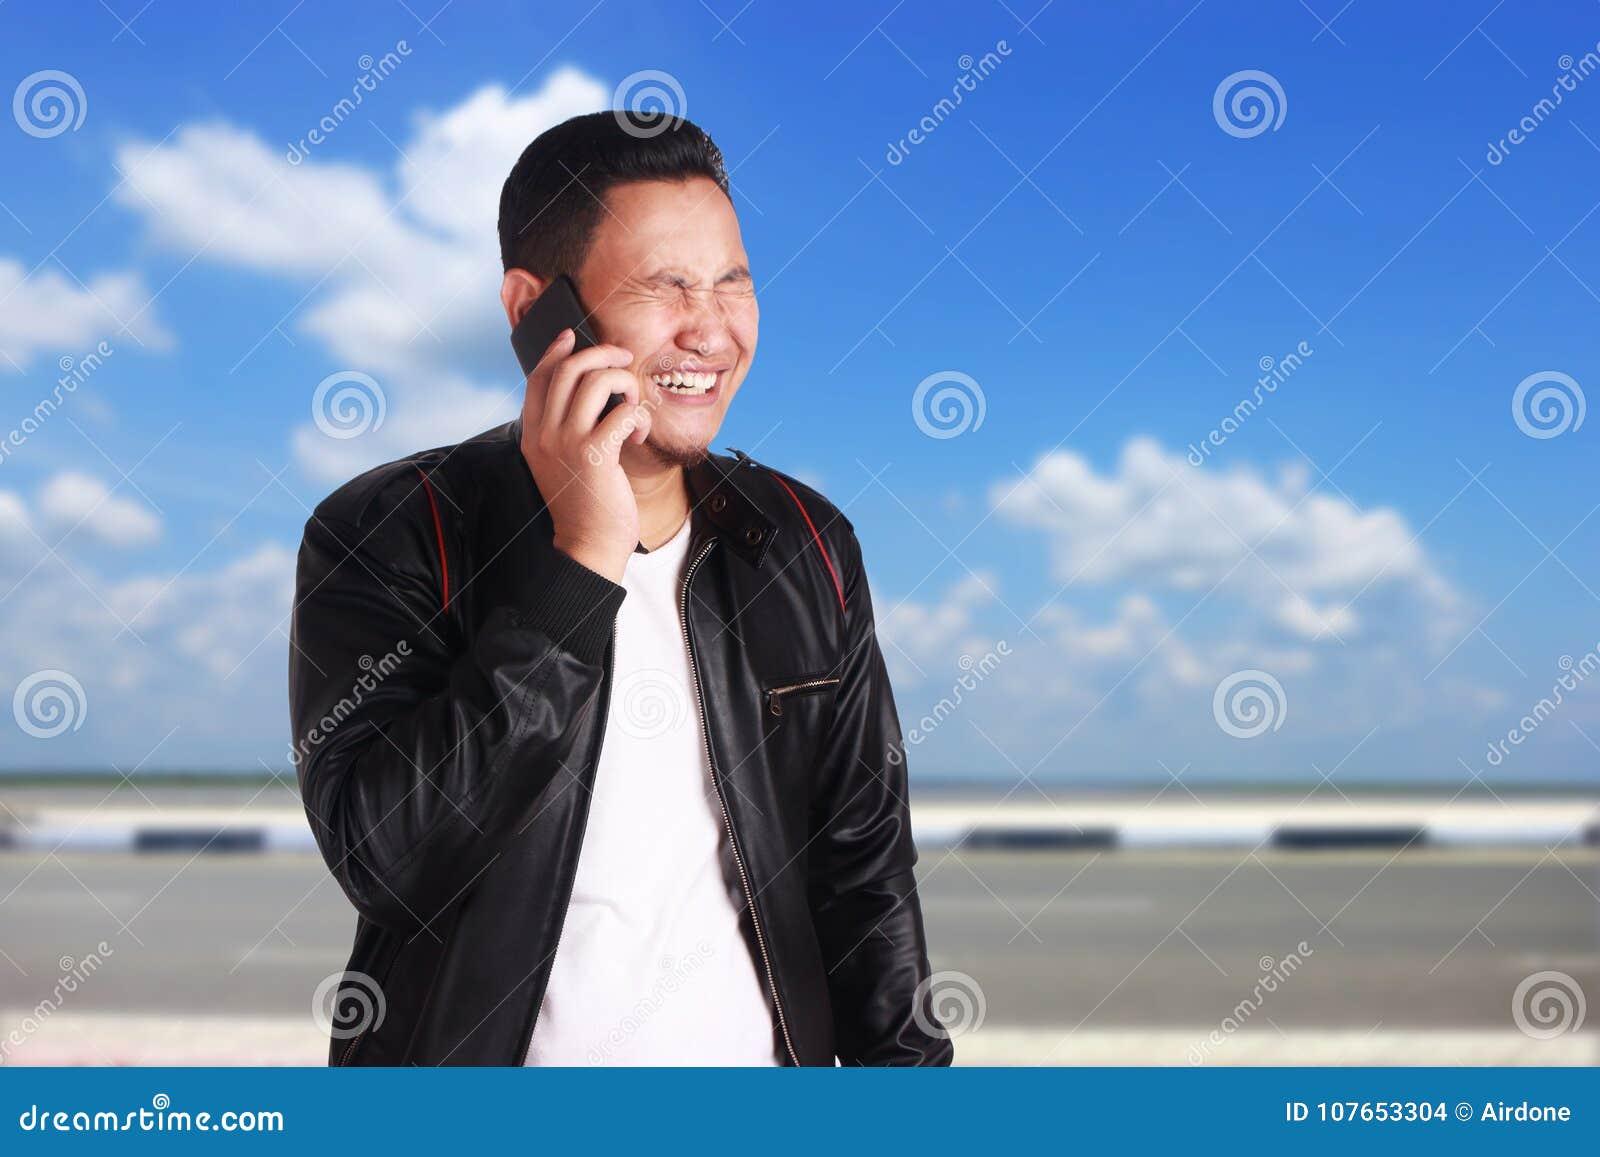 Asian Man Talking On Phone Sad Crying Expression Stock